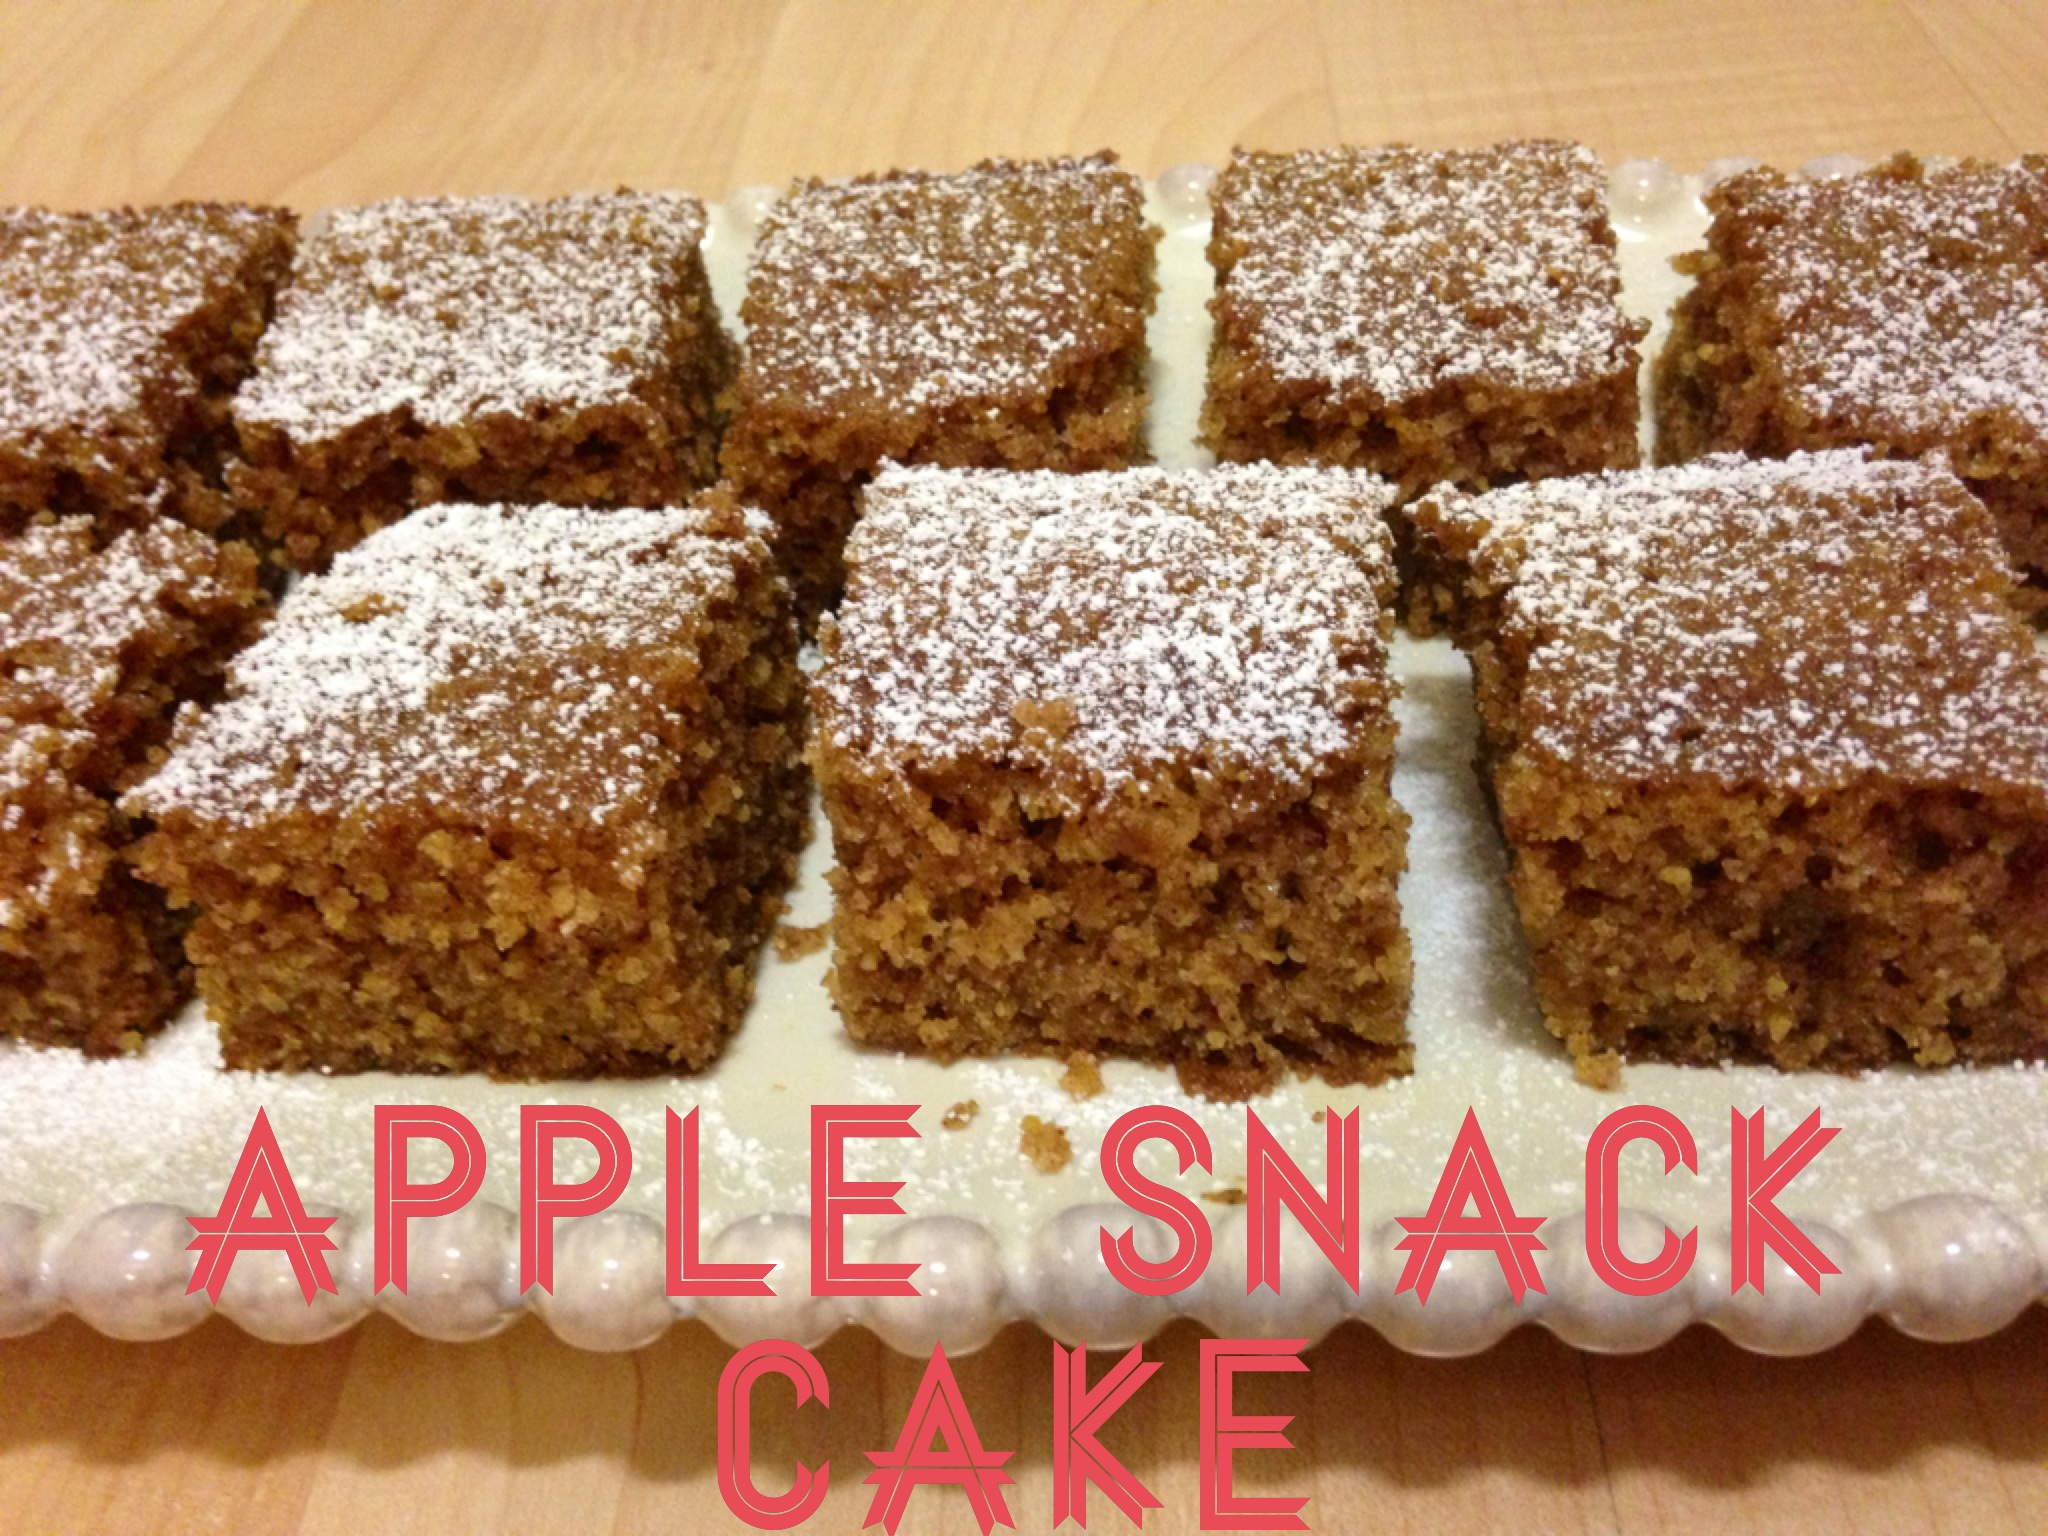 applesnackcake